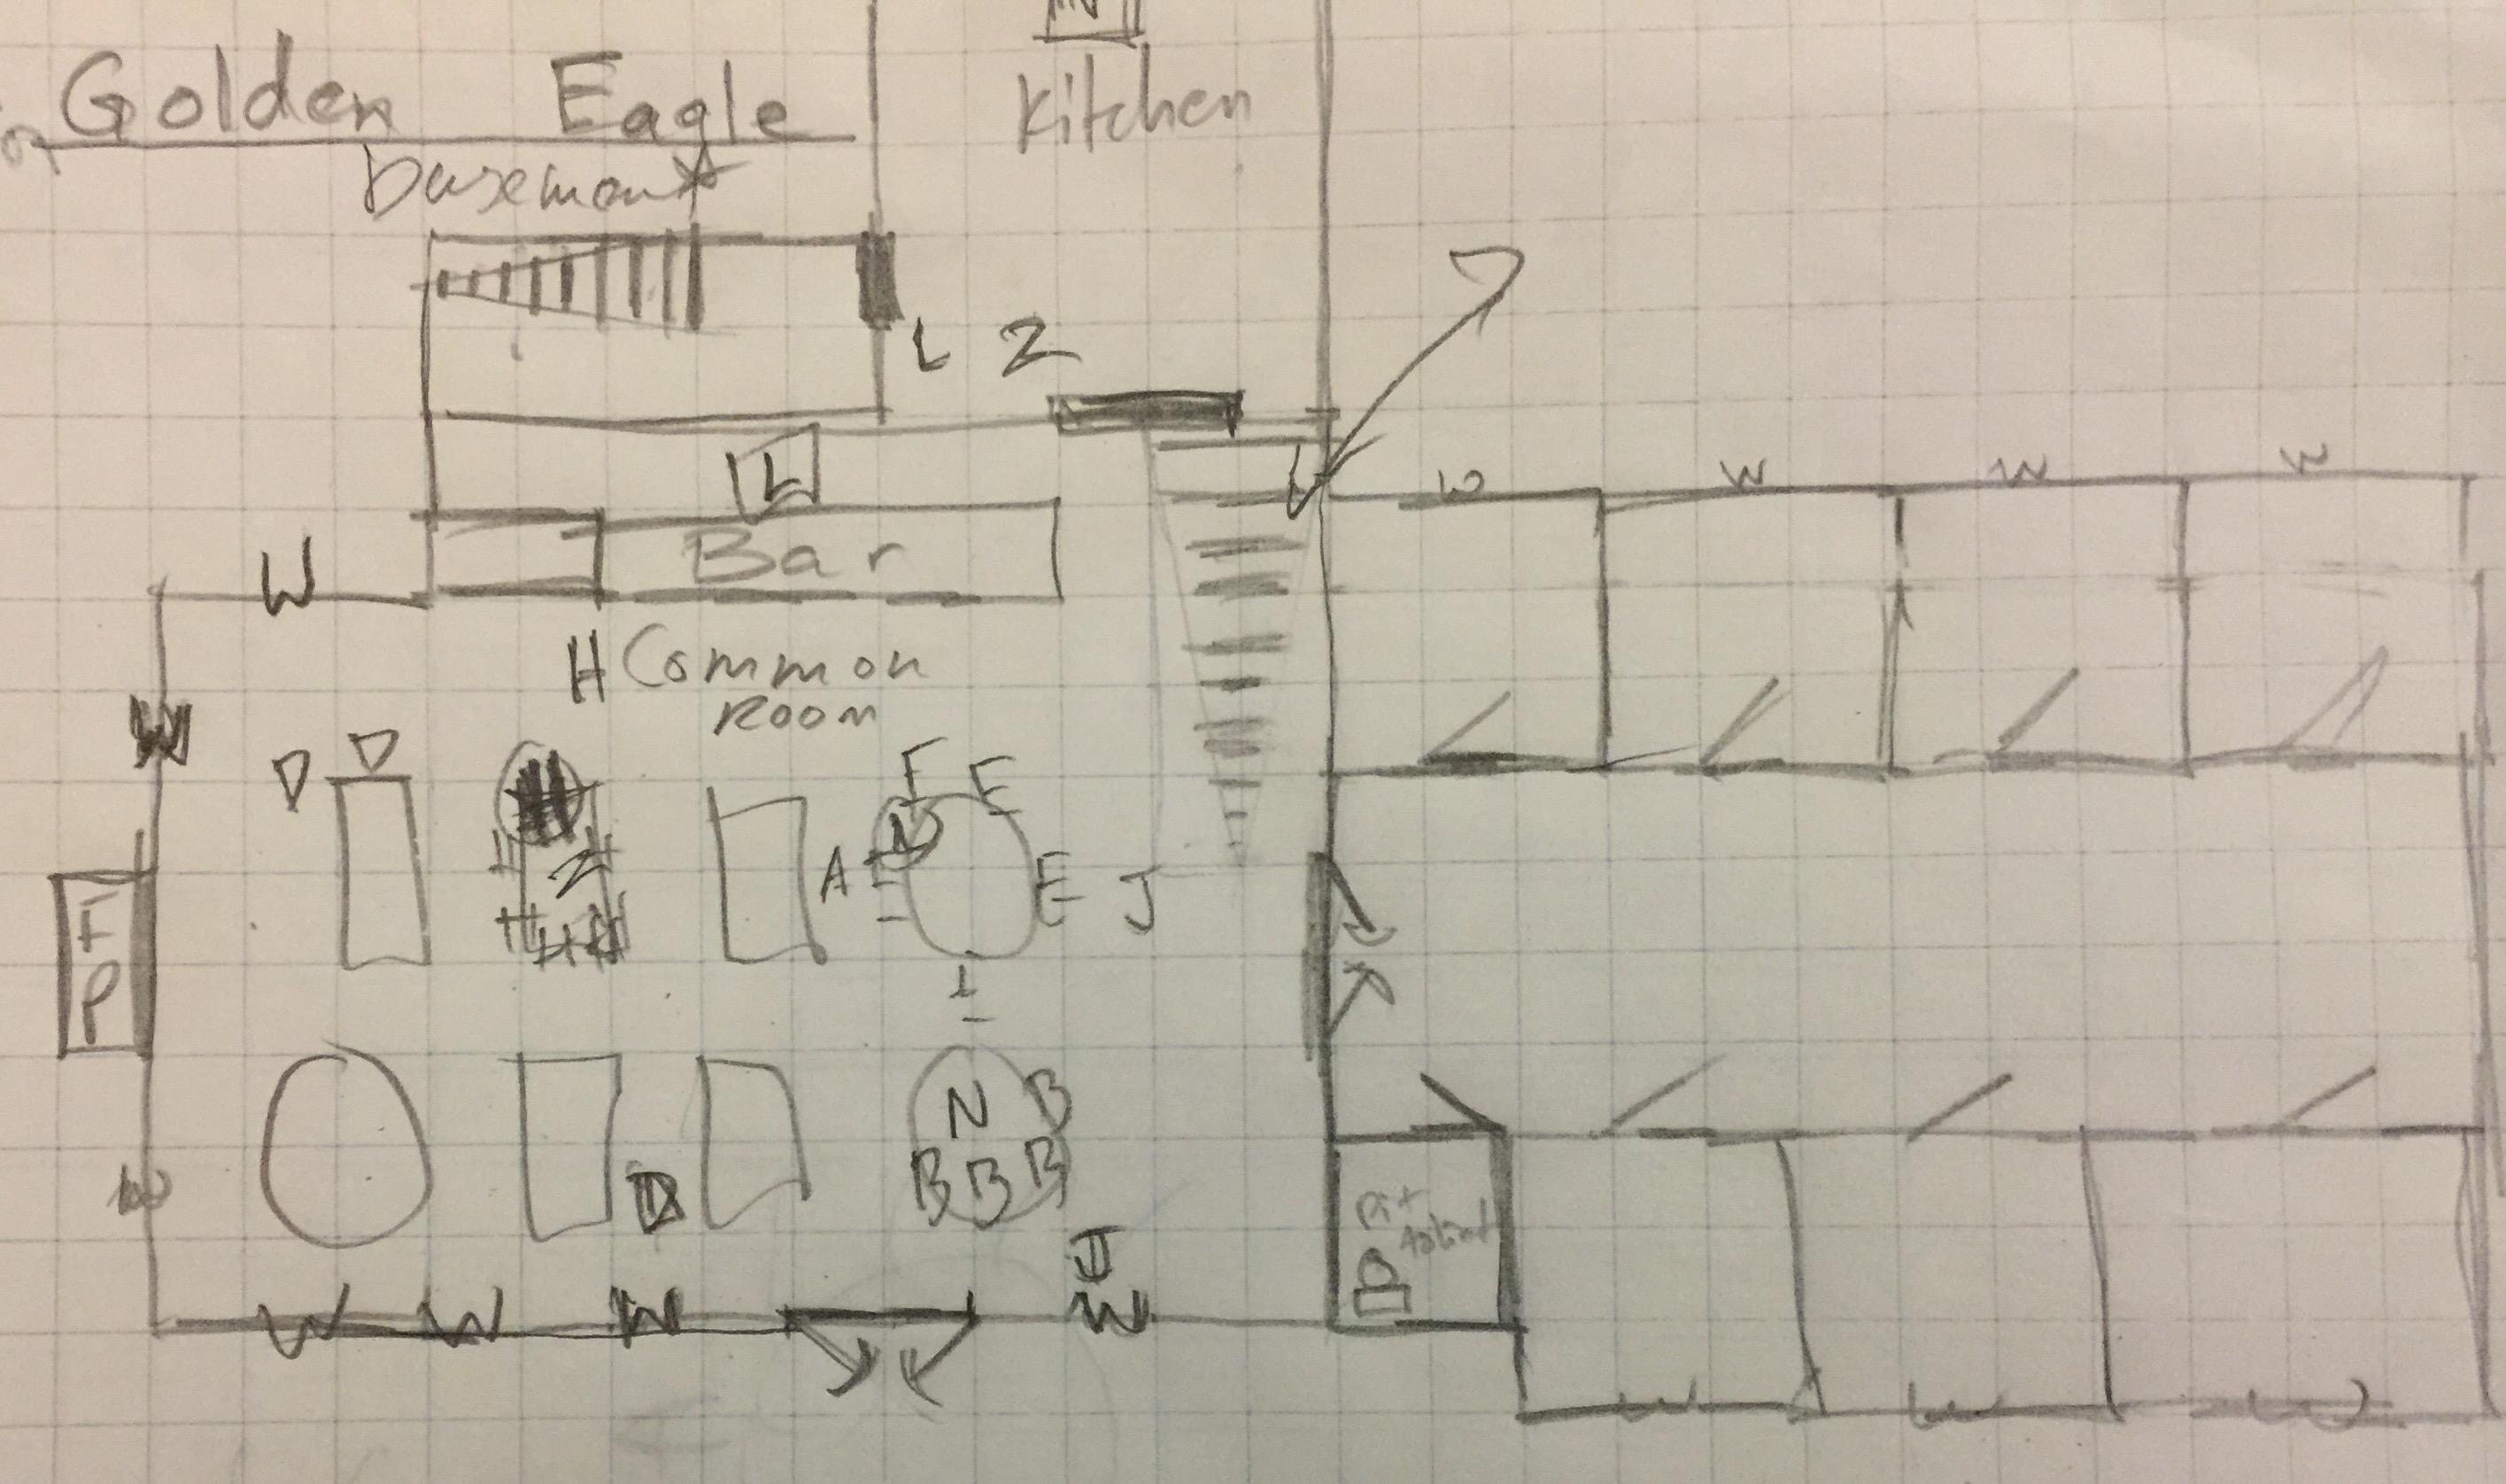 The_Golden_Eagle_Map.jpeg